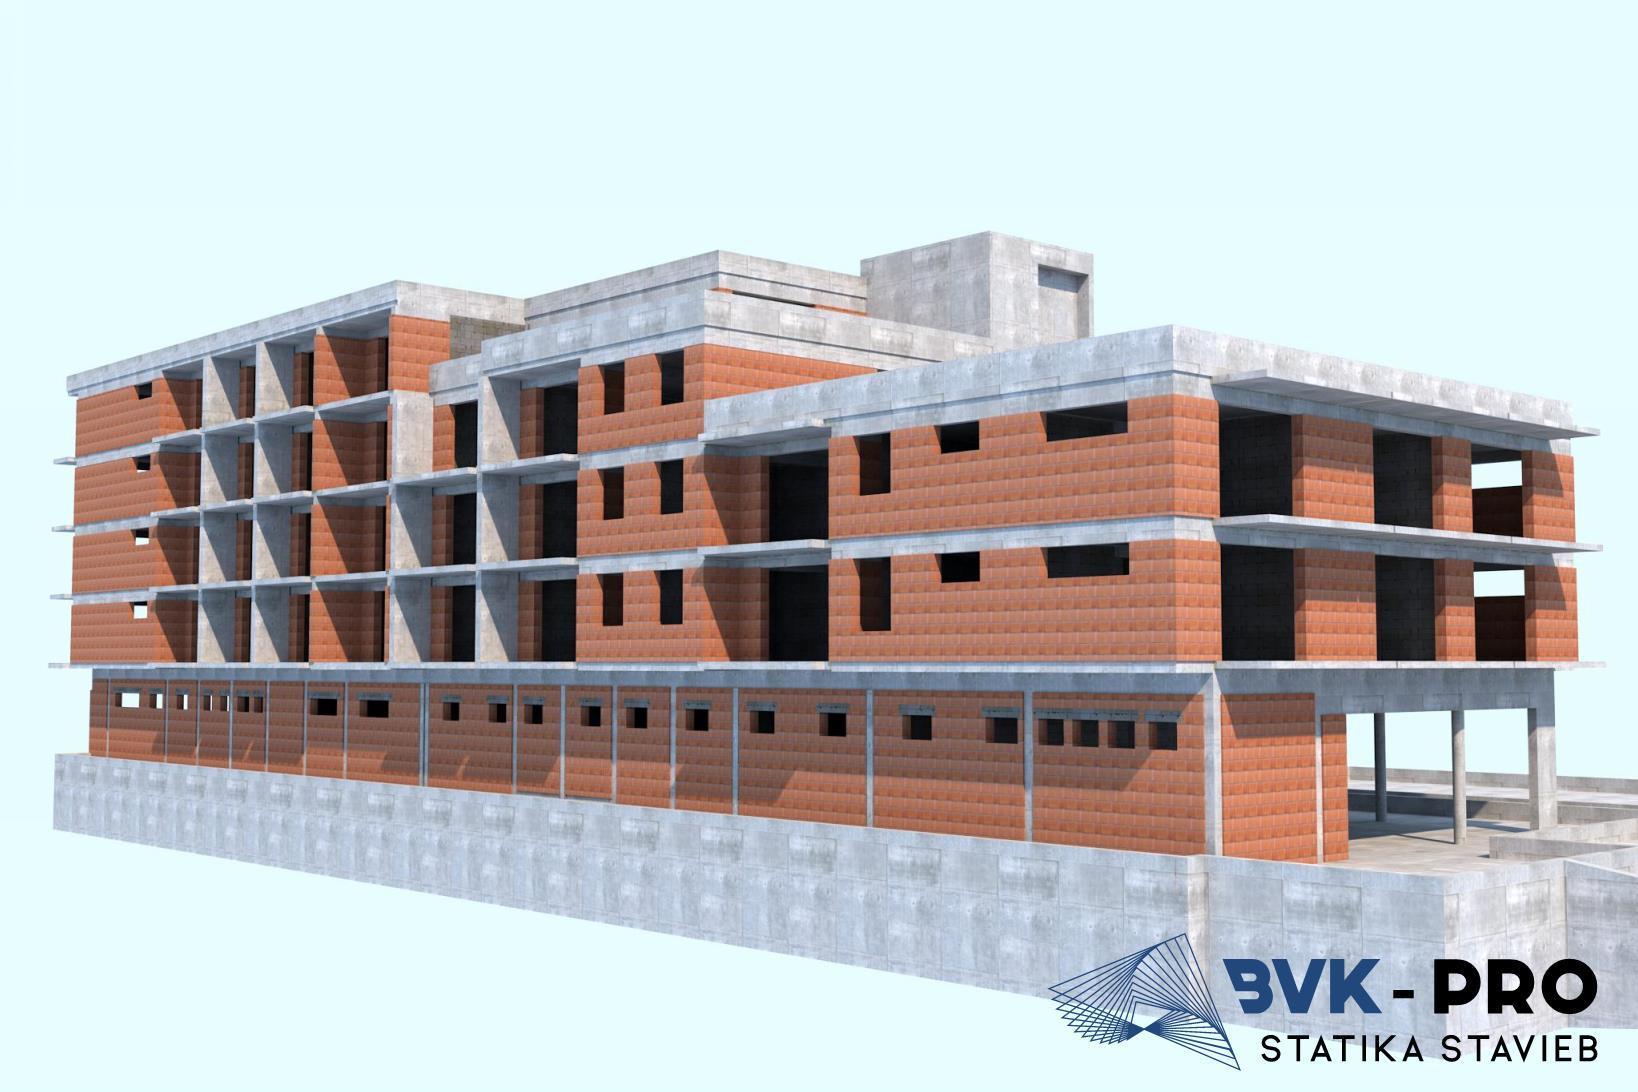 Gradus Residence Bvk Pro S R O  Page 010